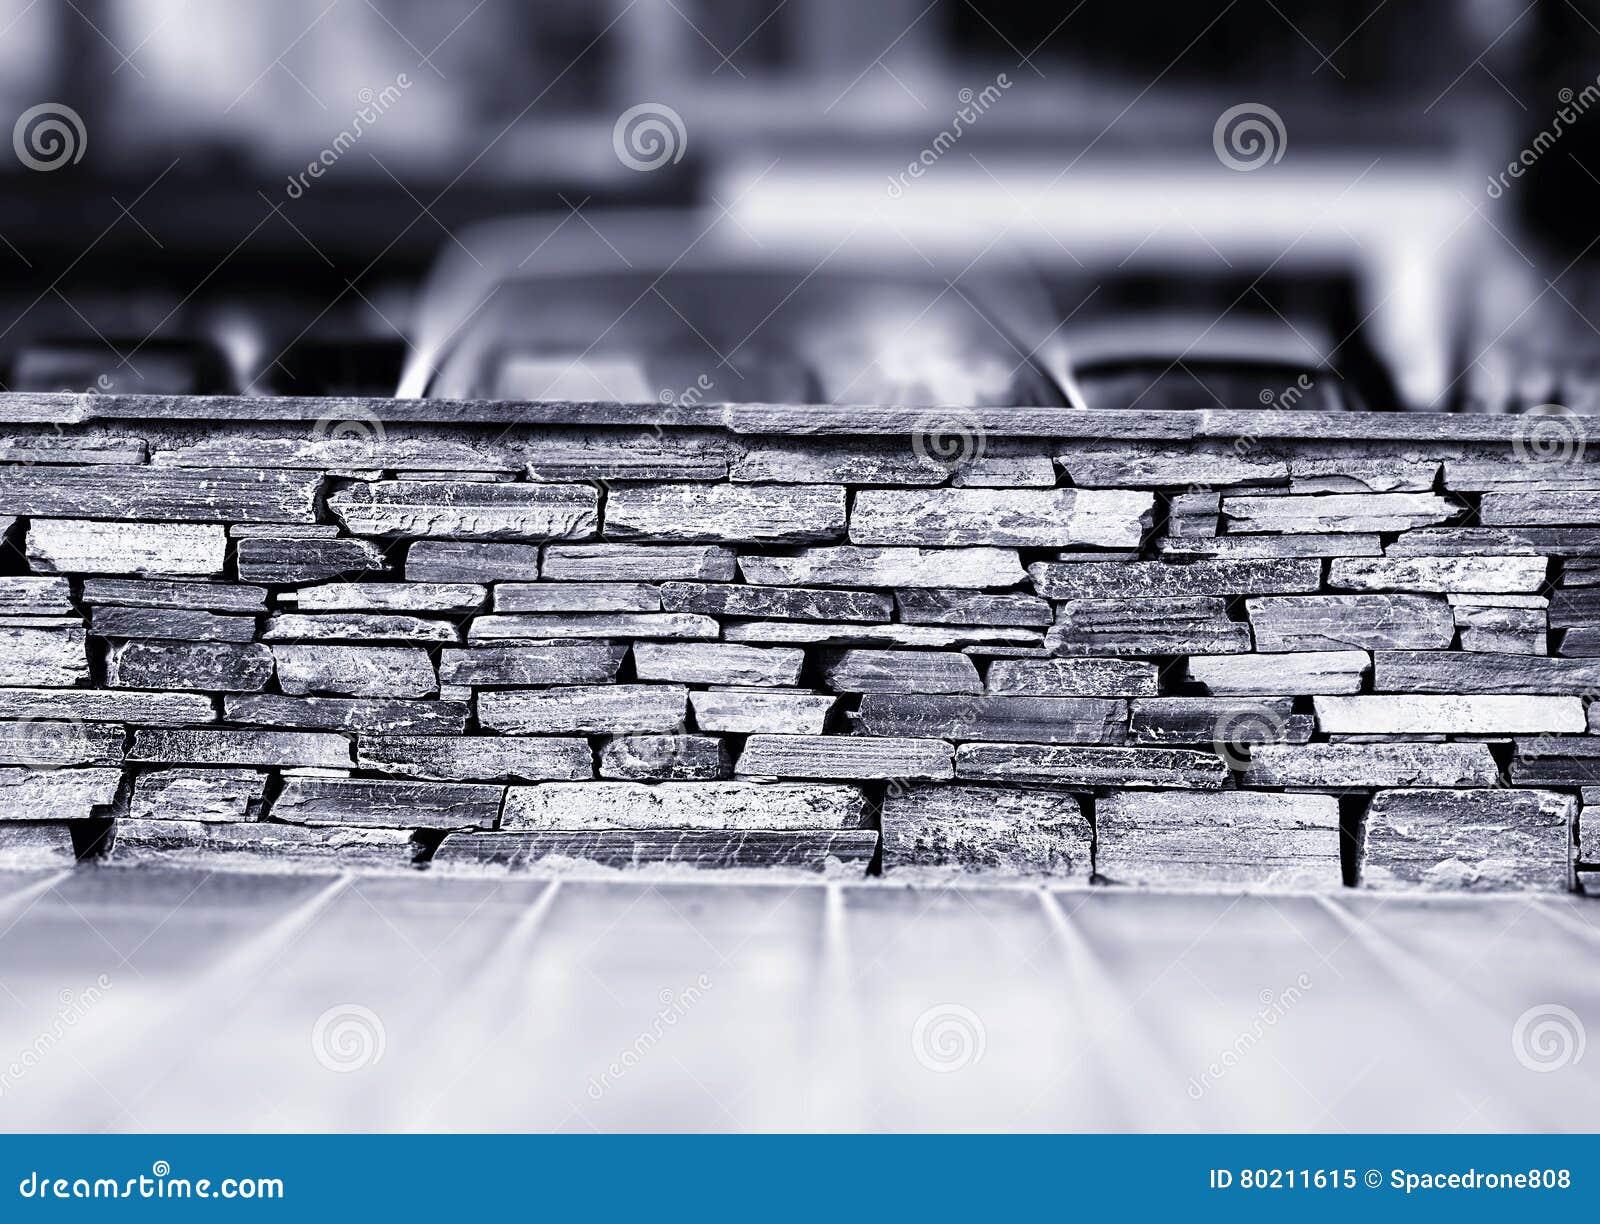 Horizontal Black And White Brick Wall Background Hd Stock Image Image Of Stone Border 80211615